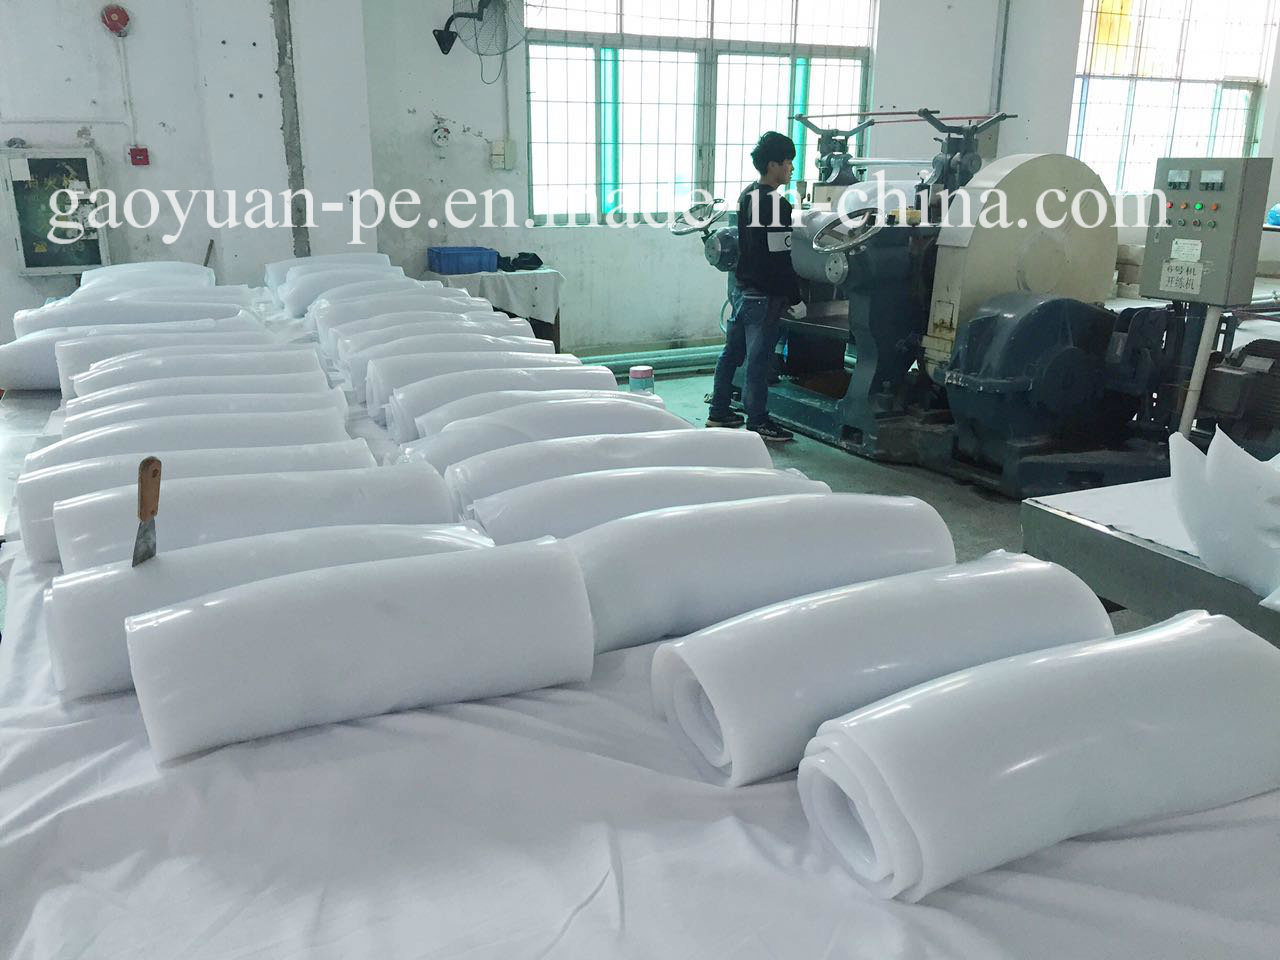 Ethylene-Propylene-Diene Monomer Silica Rubber Gel 60°